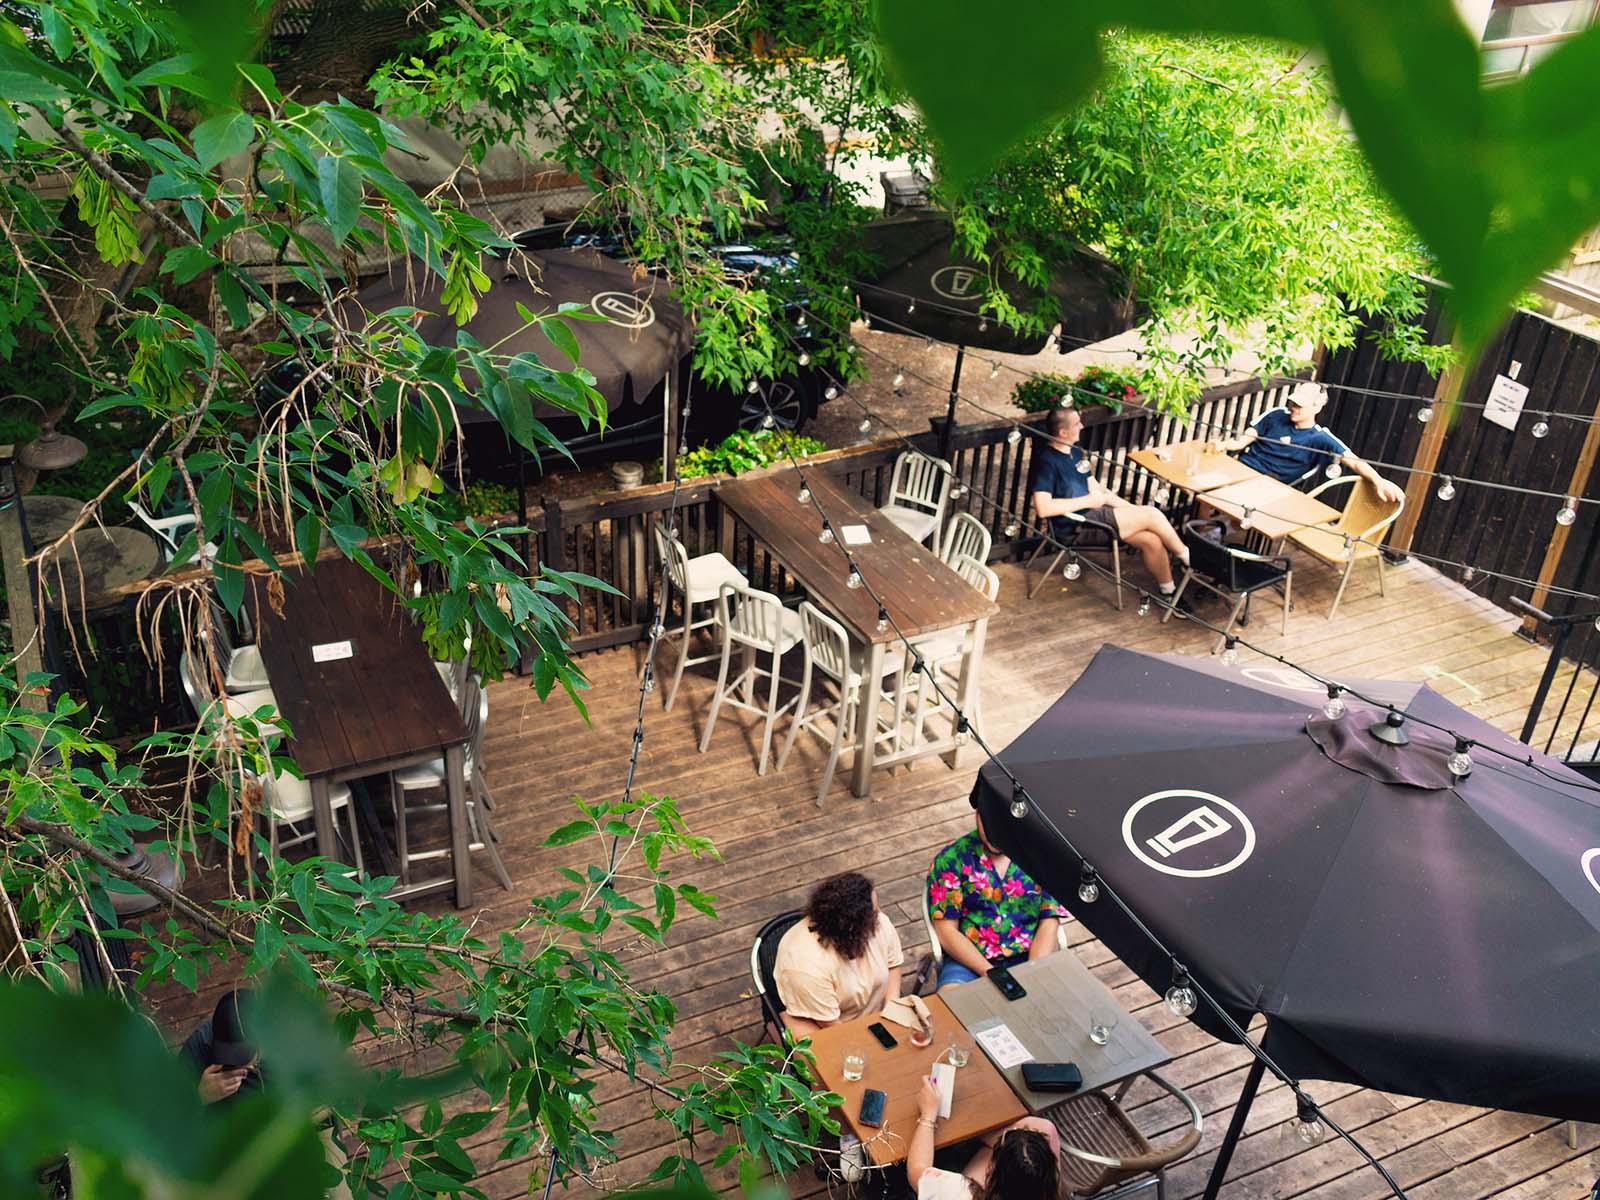 Our Backyard Oasis